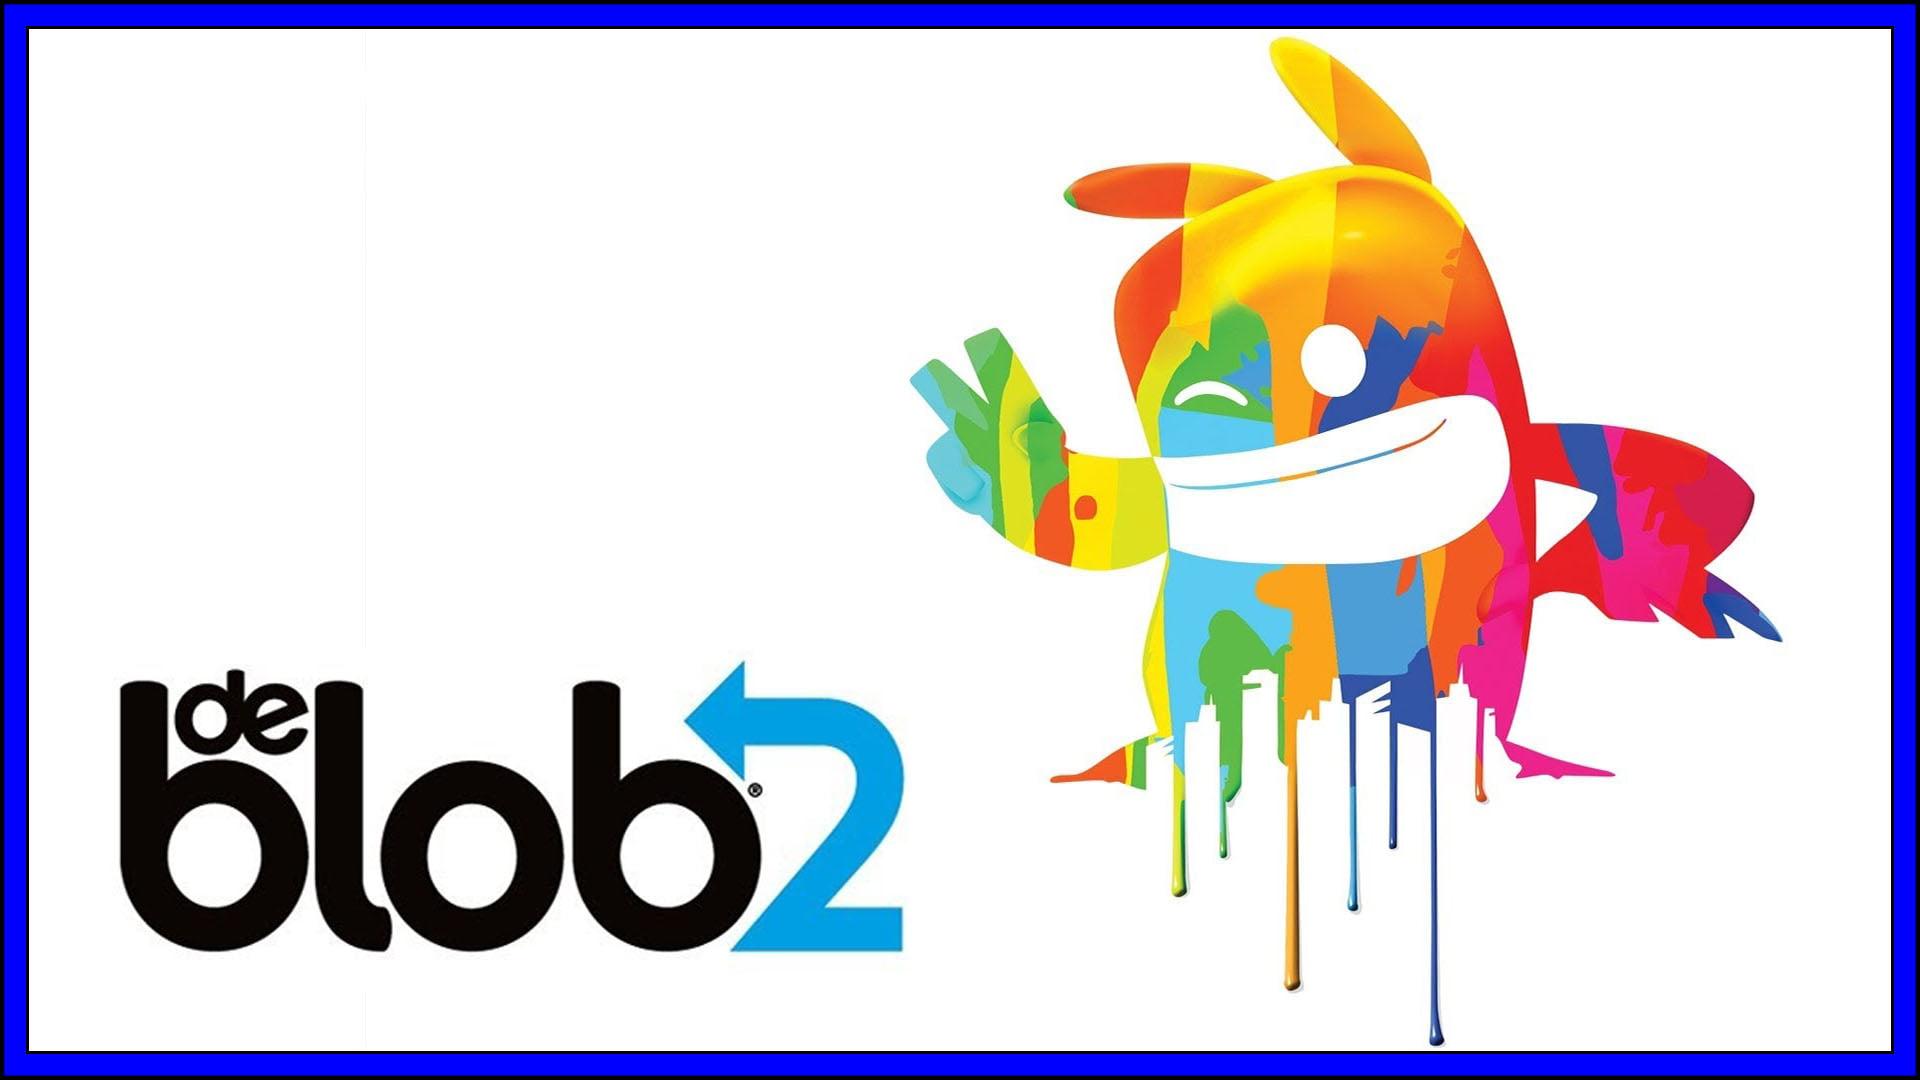 De Bob 2 Fi3